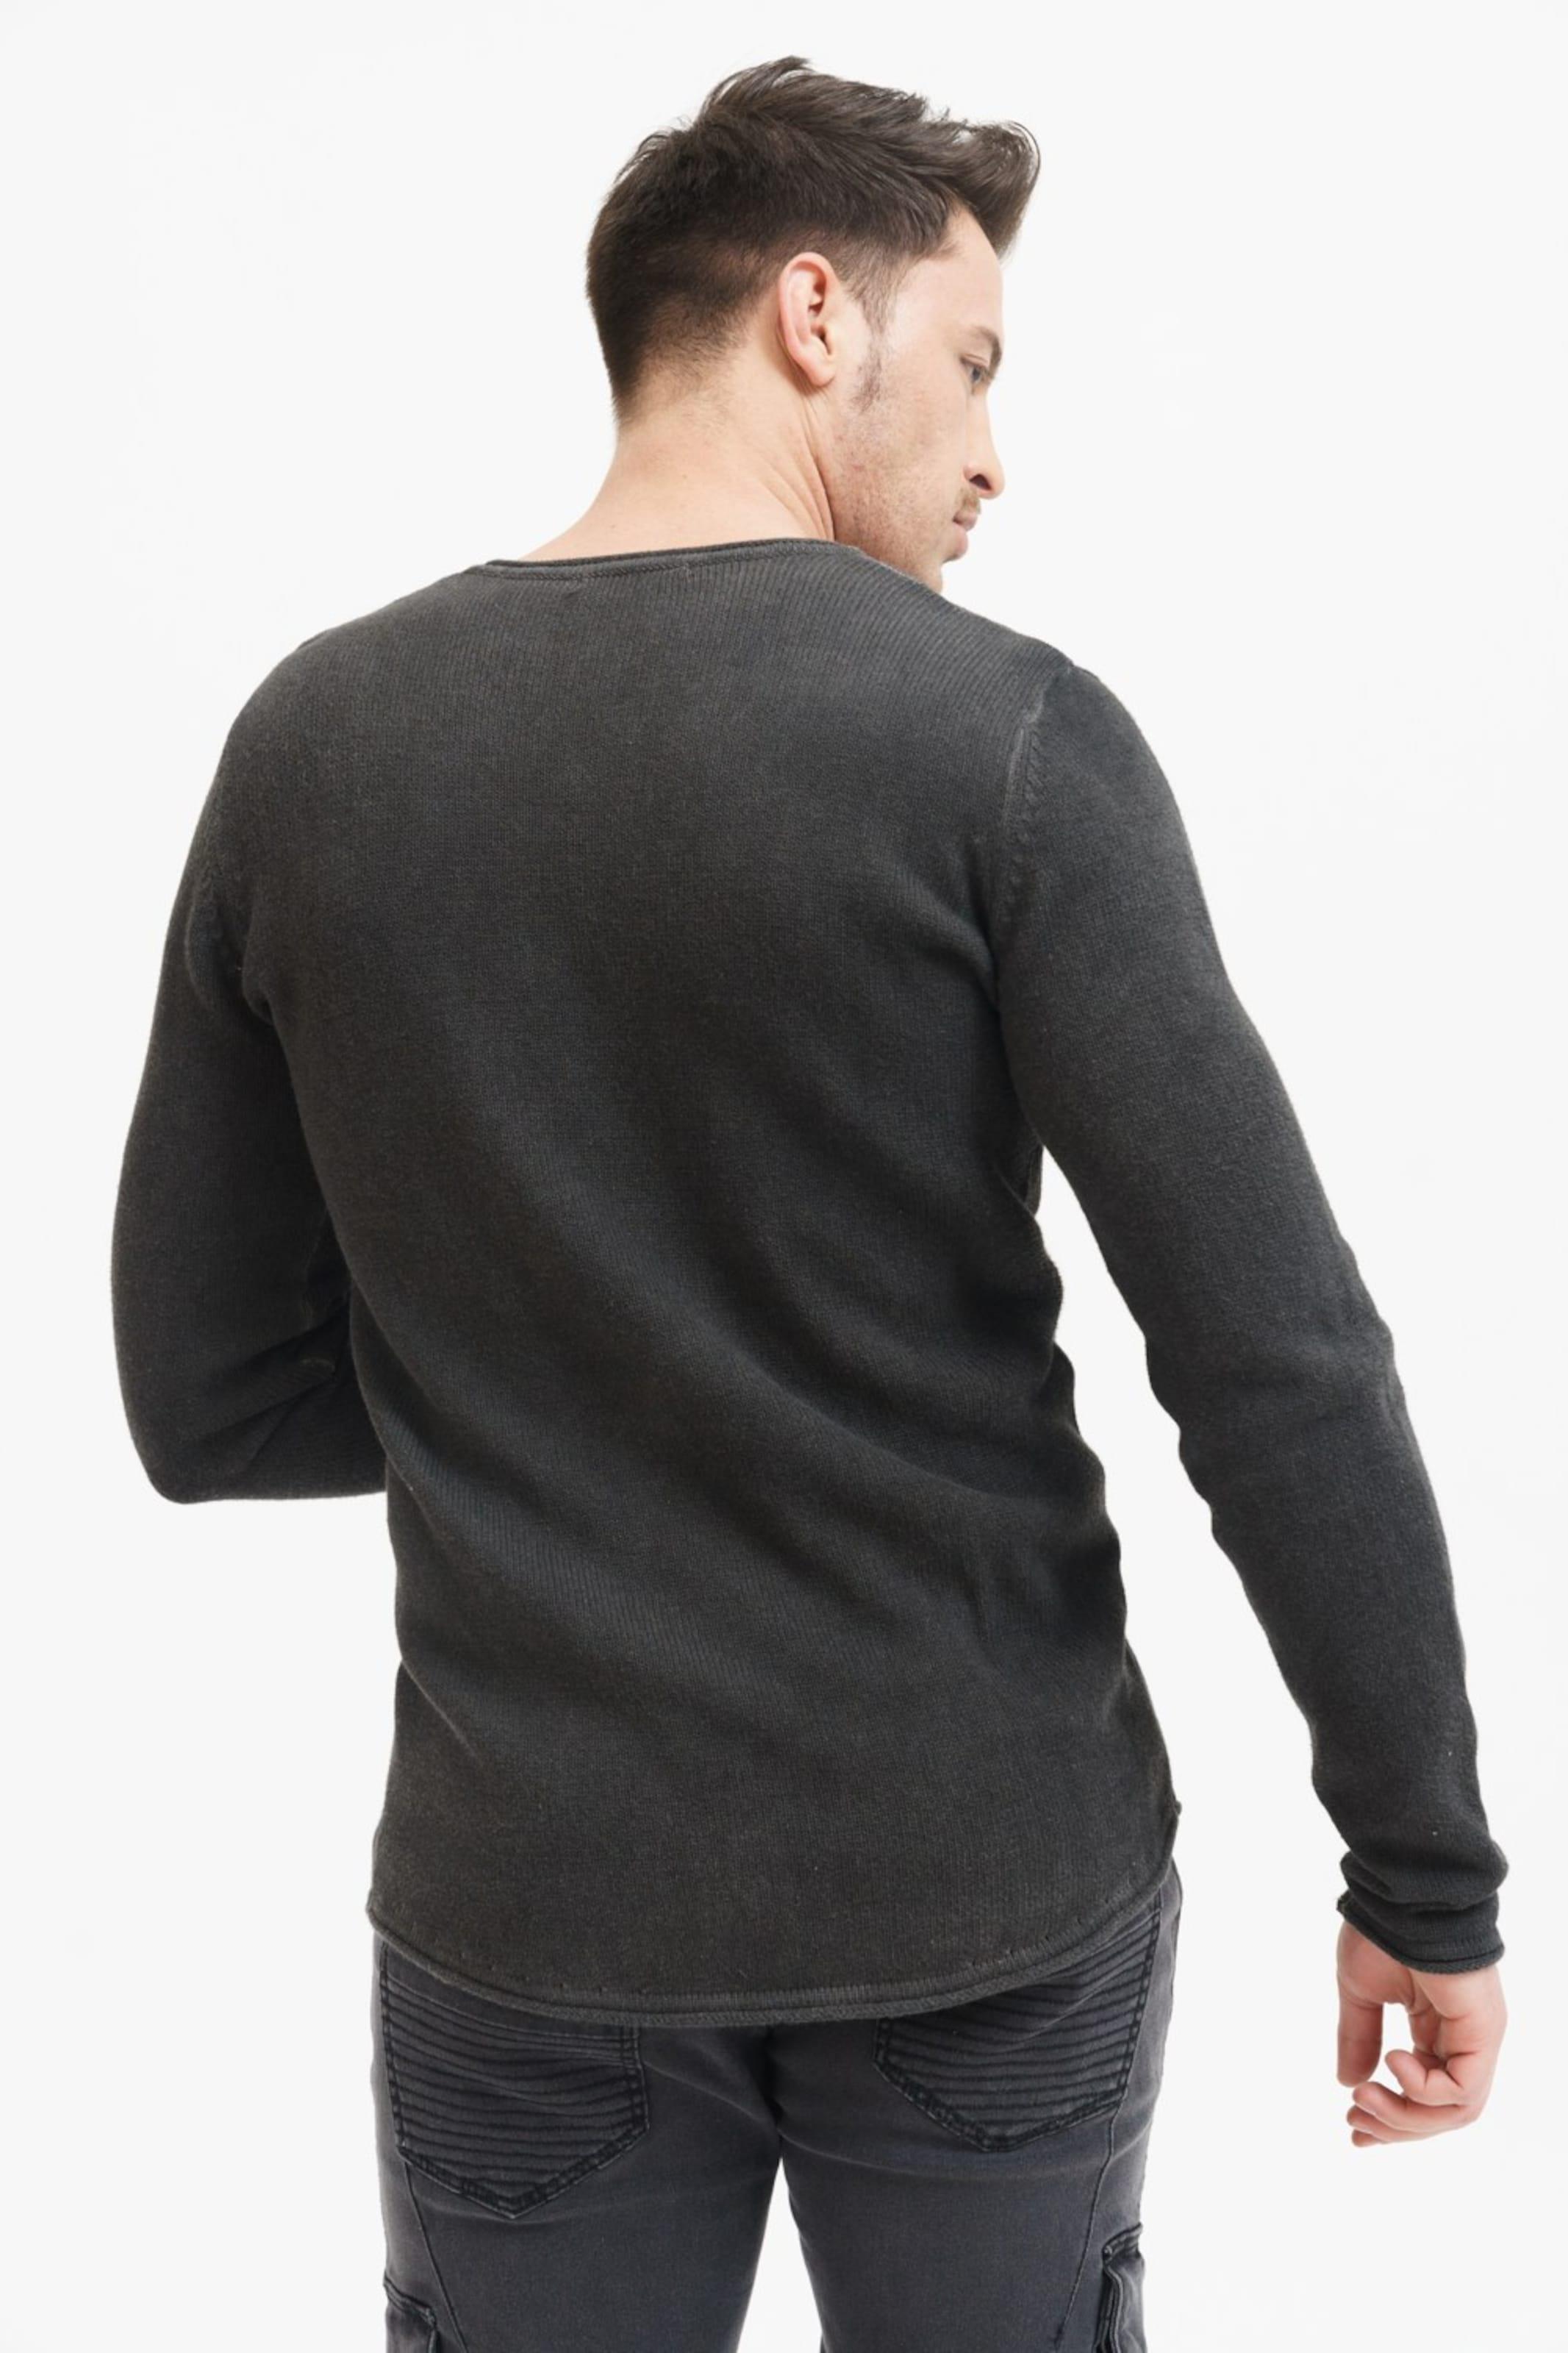 Anthrazit Trueprodigy In In Anthrazit Anthrazit Pullover Trueprodigy Trueprodigy Pullover In Pullover Trueprodigy Pullover In PXukOiZ